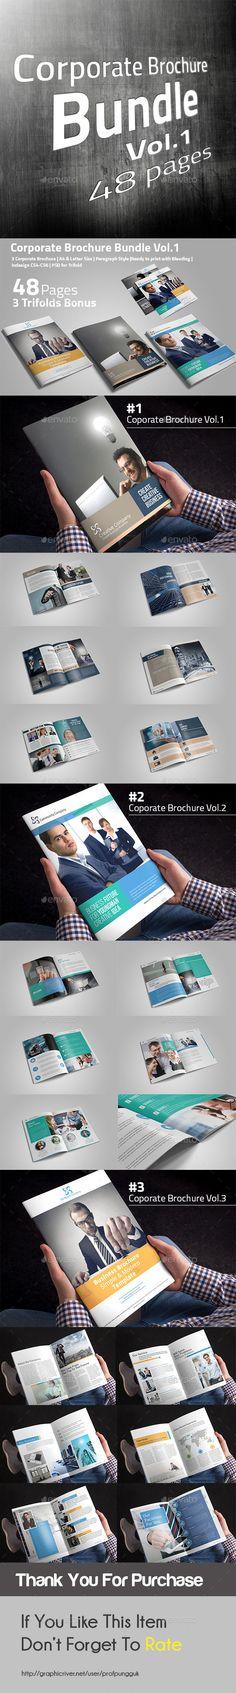 Corporate Brochure Bundle Templates InDesign INDD #design Download: http://graphicriver.net/item/corporate-brochure-bundle-vol1/13771941?ref=ksioks